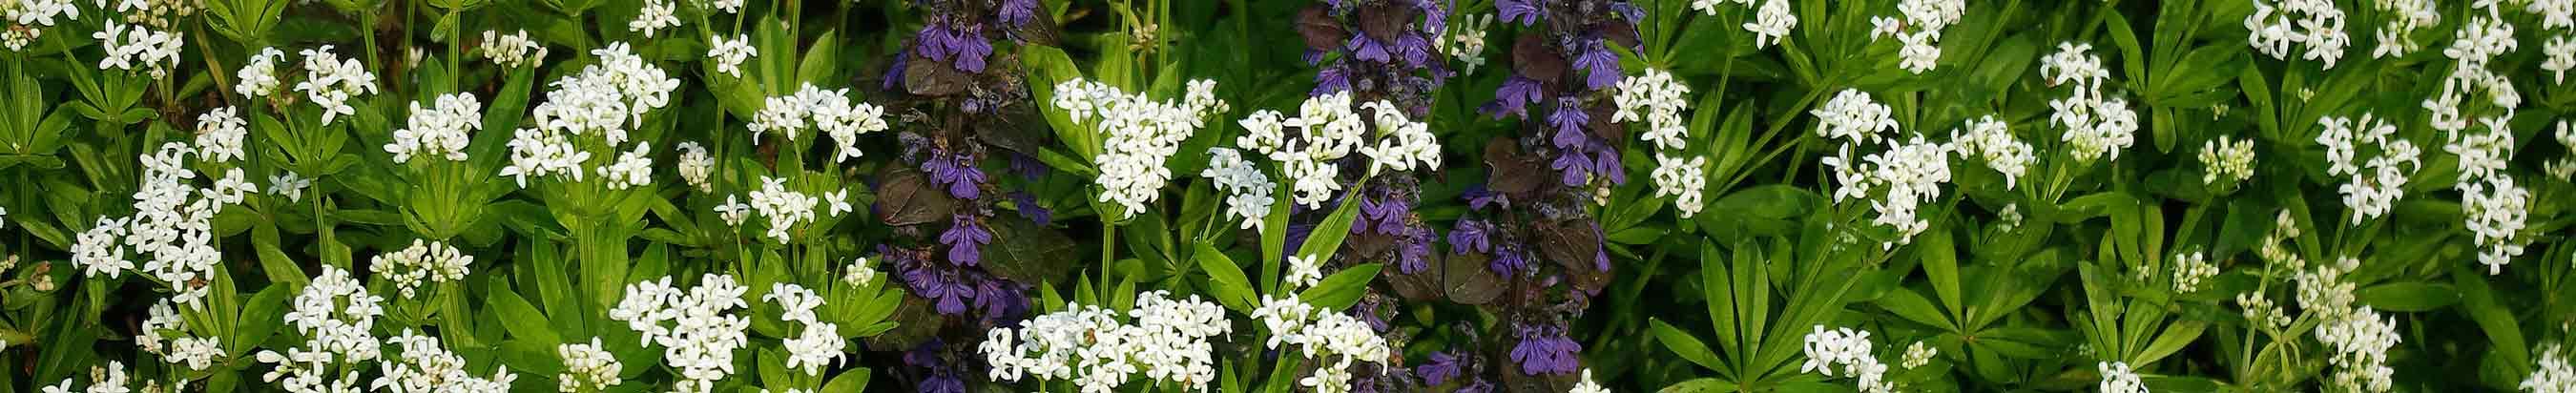 Woodland flower border with Galium and Ajuga